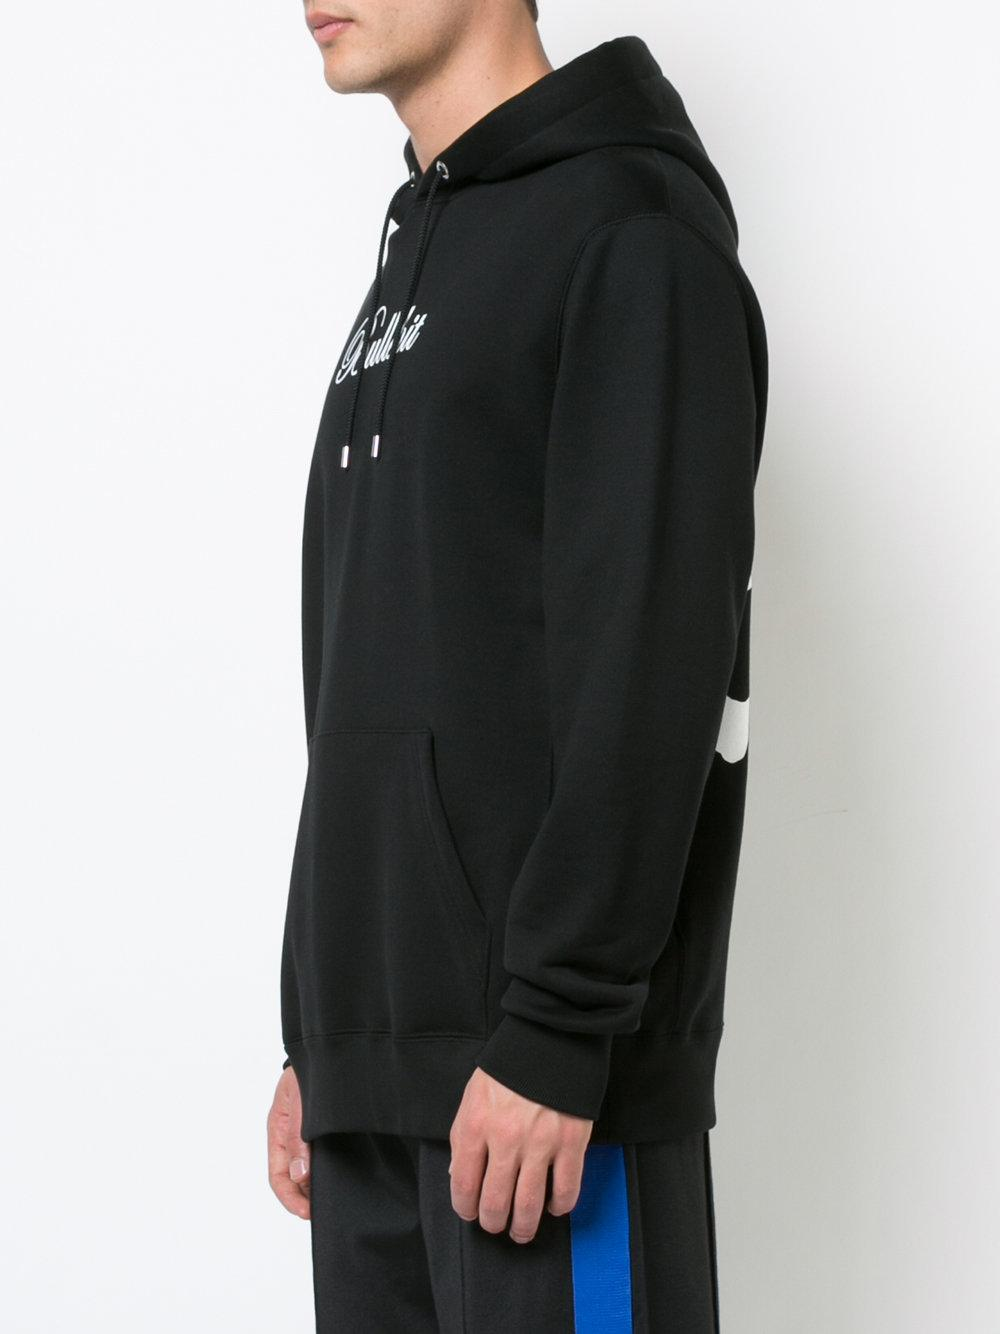 Mastermind Japan Cotton Bullshit Hoodie in Black for Men